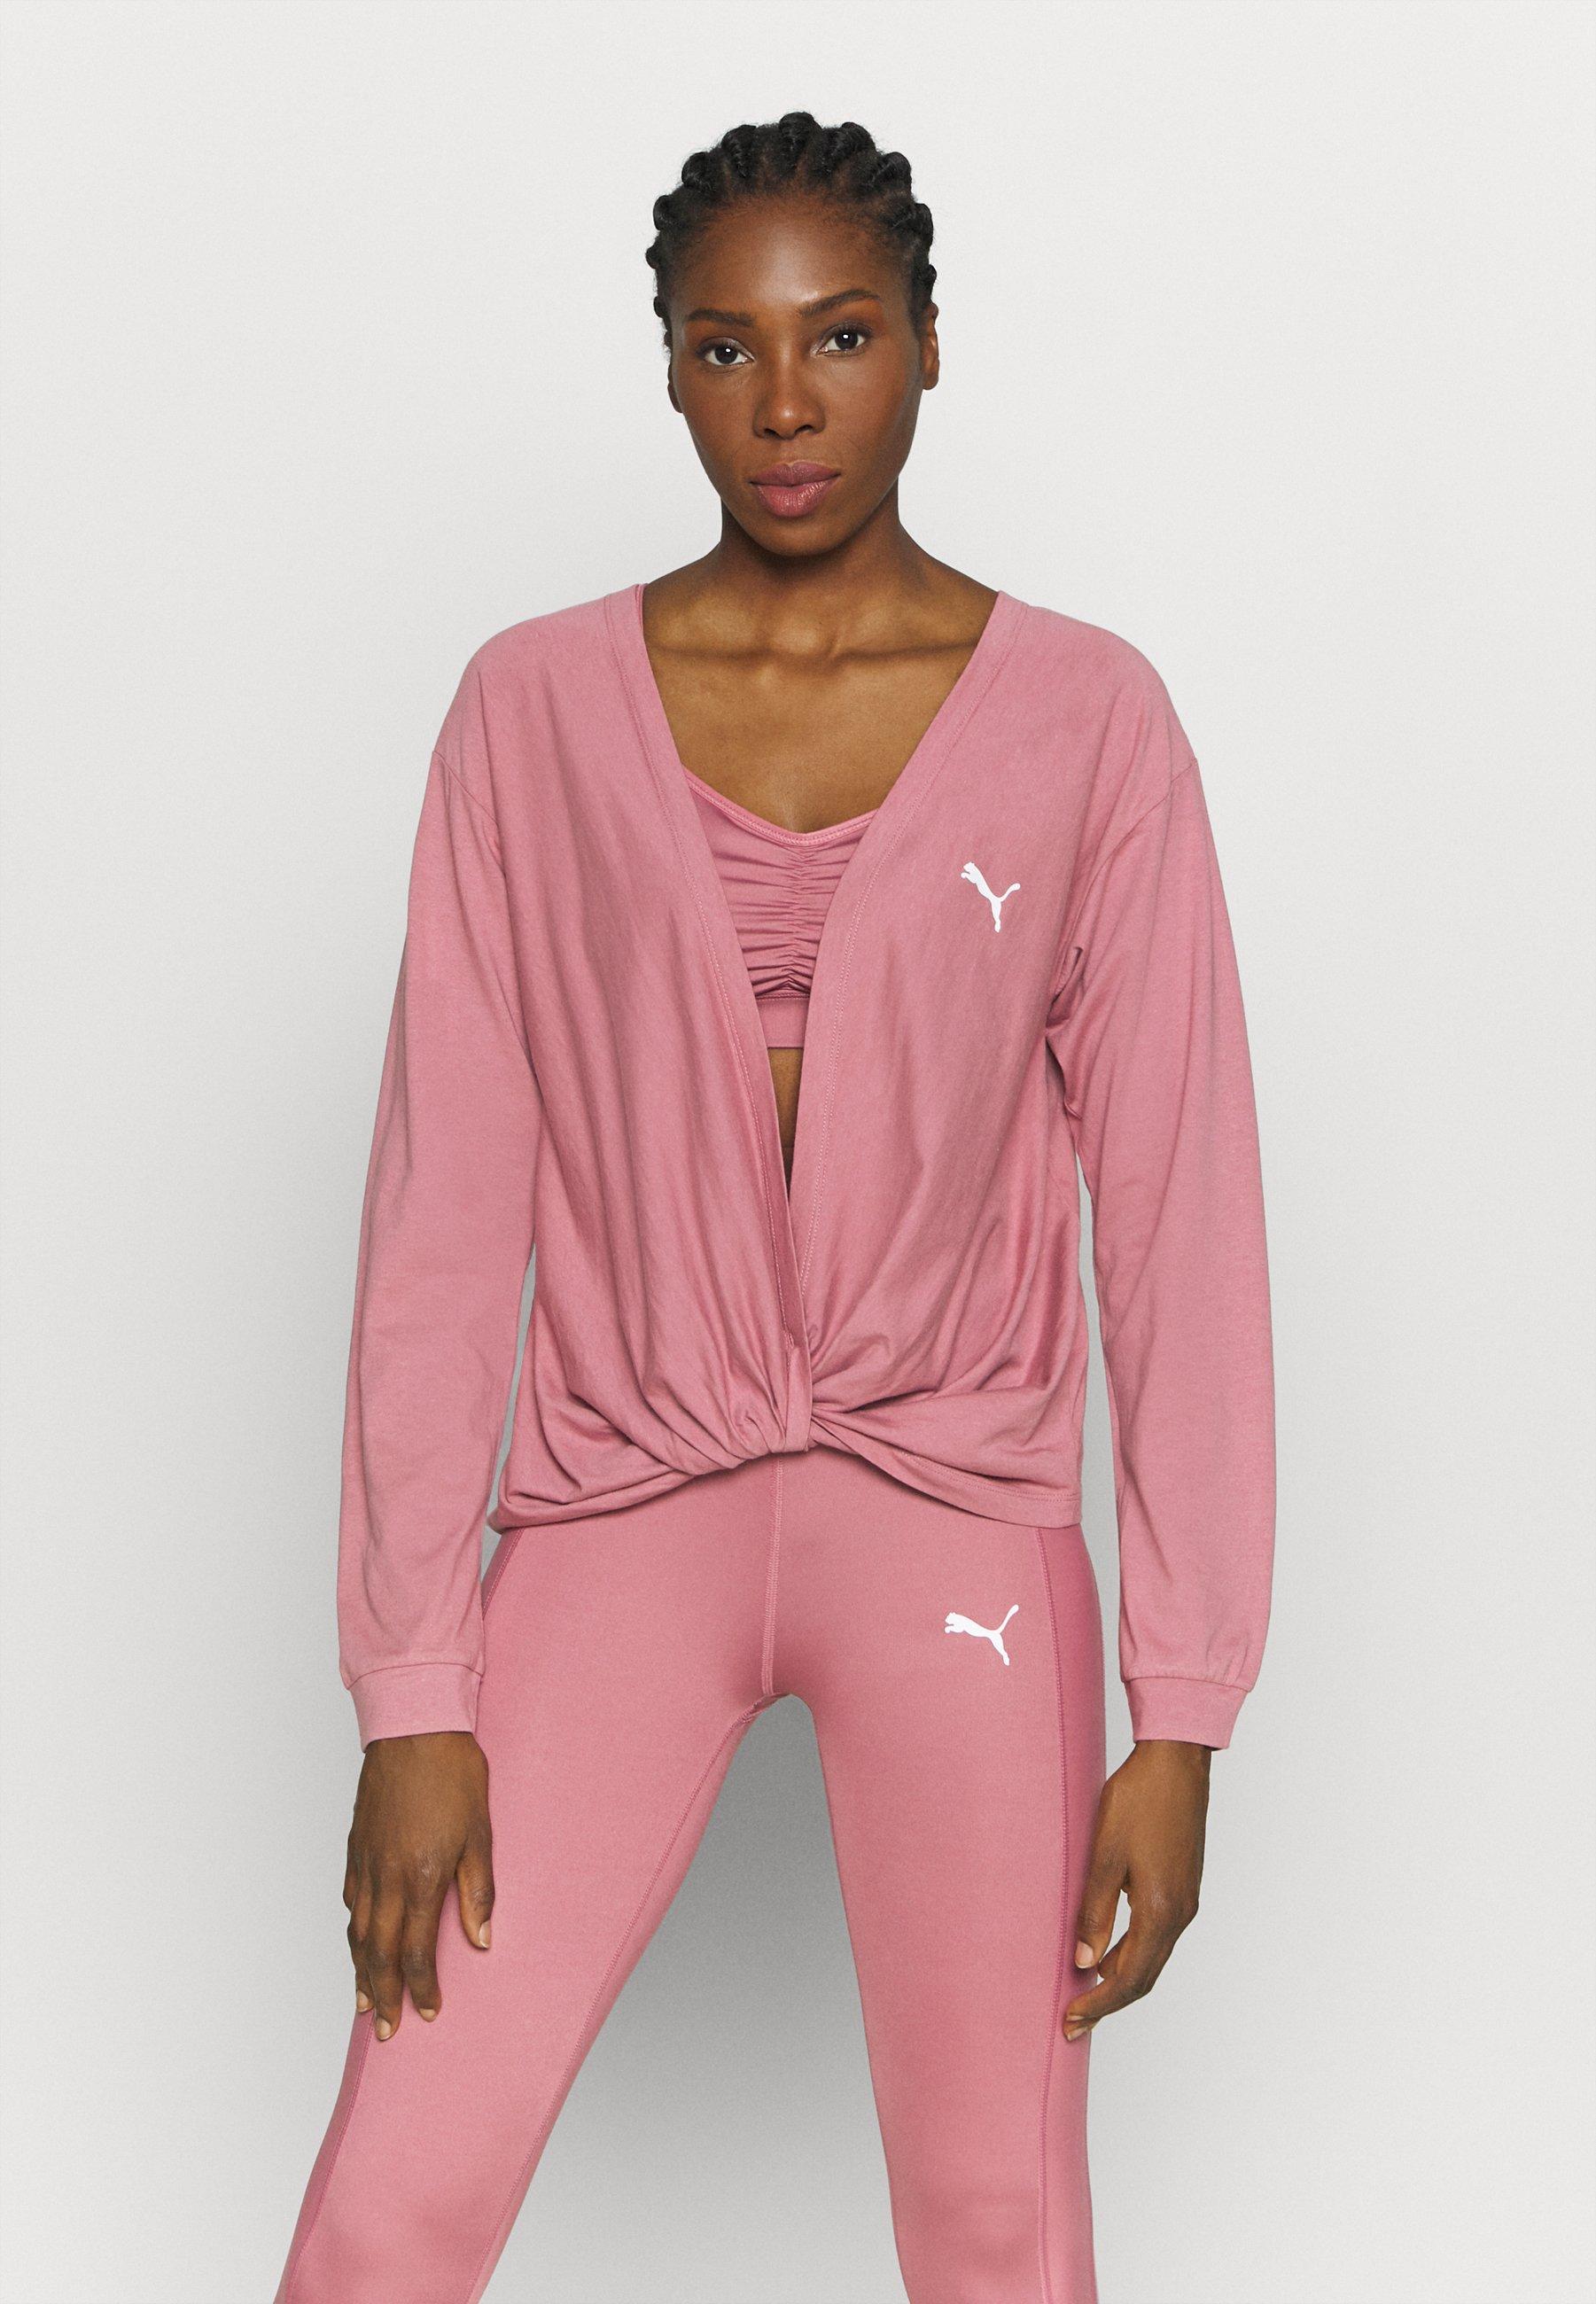 Women PAMELA REIF X PUMA COLLECTION OVERLAY CREW - Long sleeved top